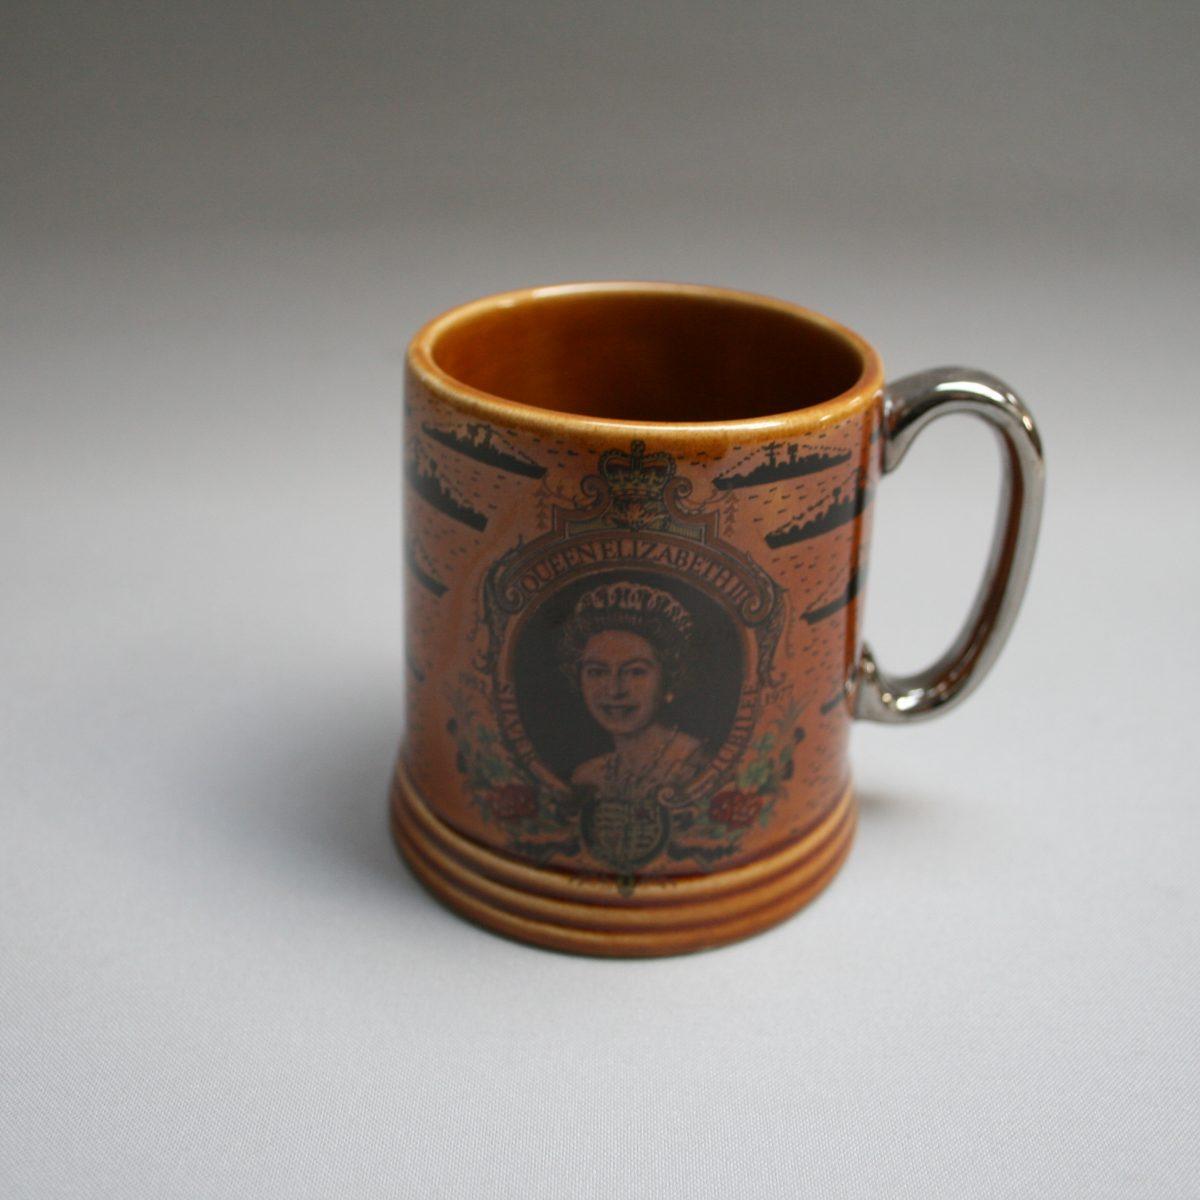 Silver jubilee mug of Queen Elizabeth II/williamsantiques